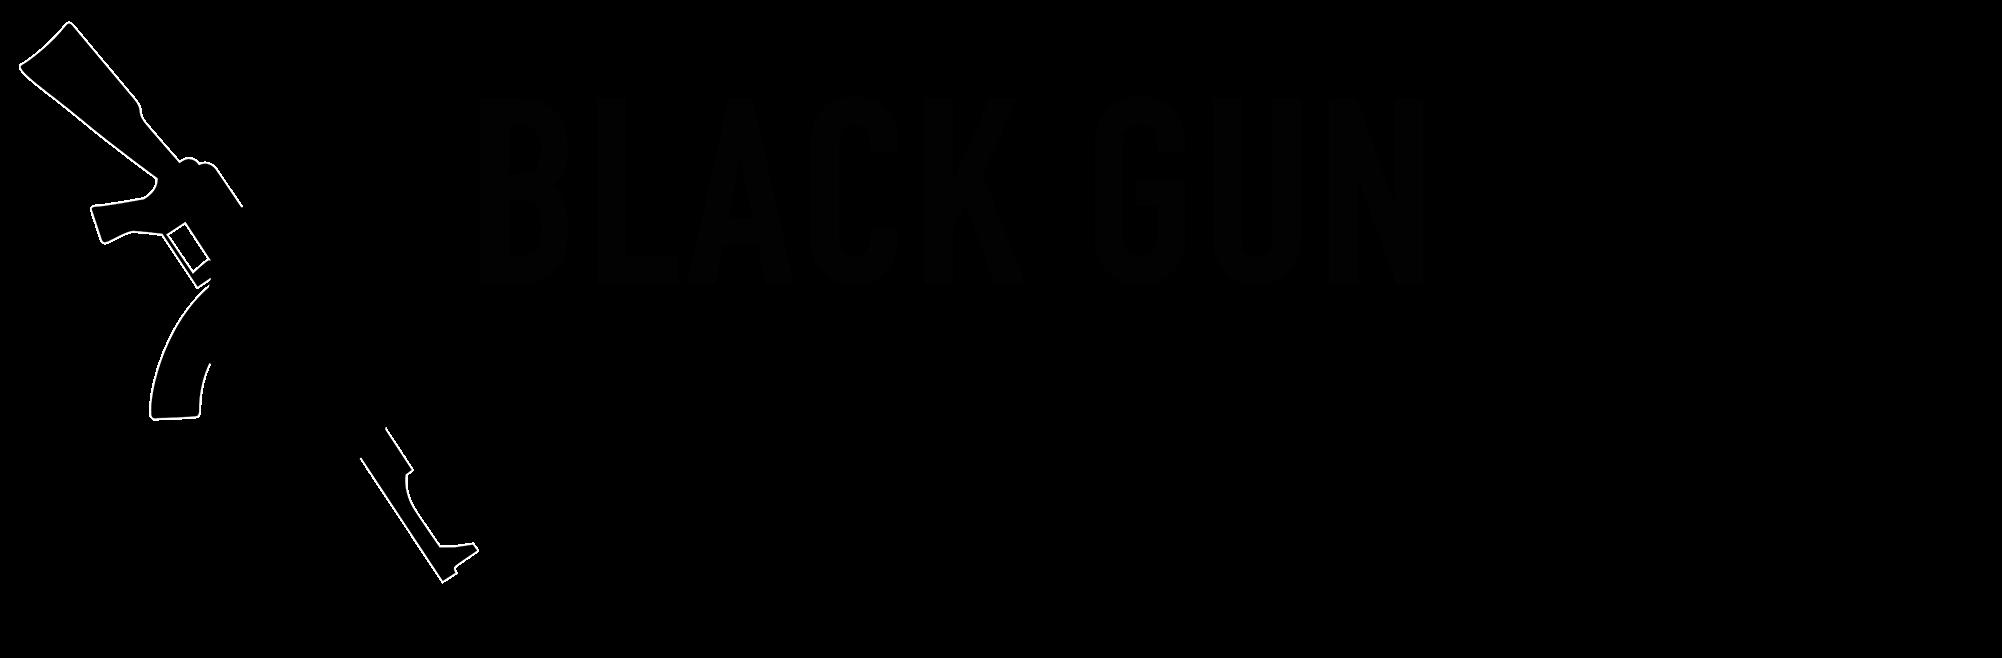 Black Gun Resource Guide